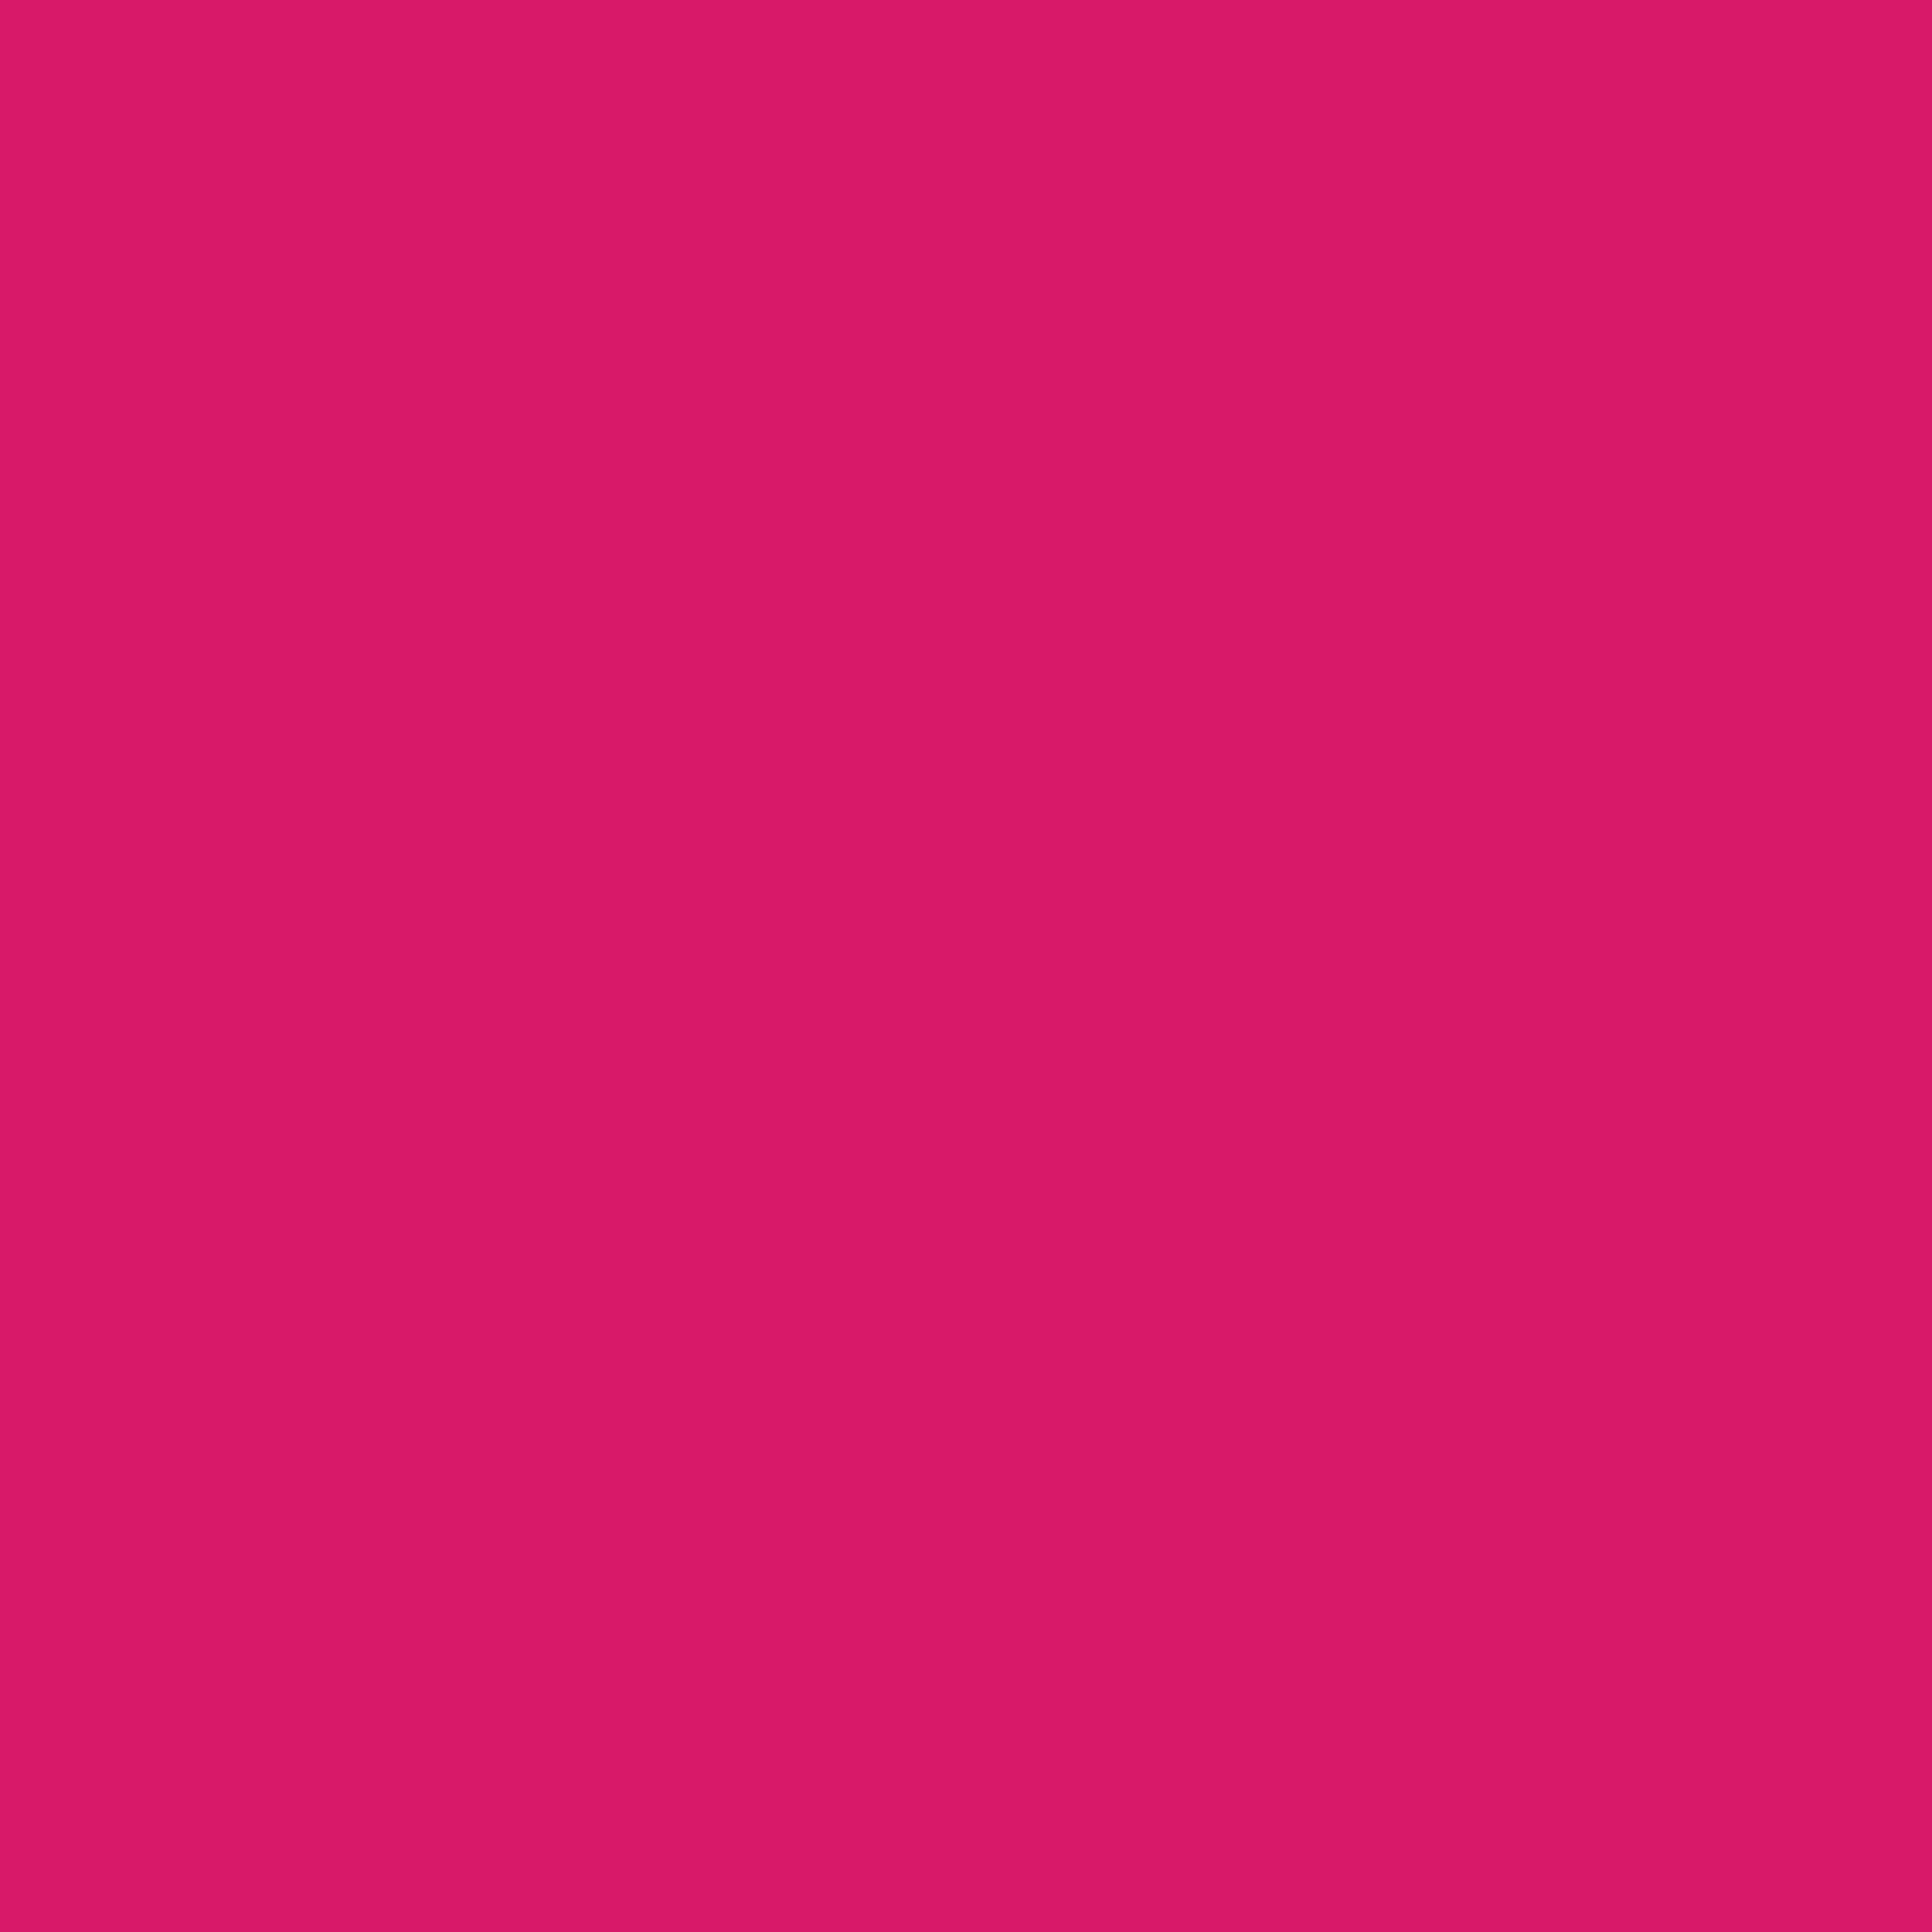 2732x2732 Dogwood Rose Solid Color Background